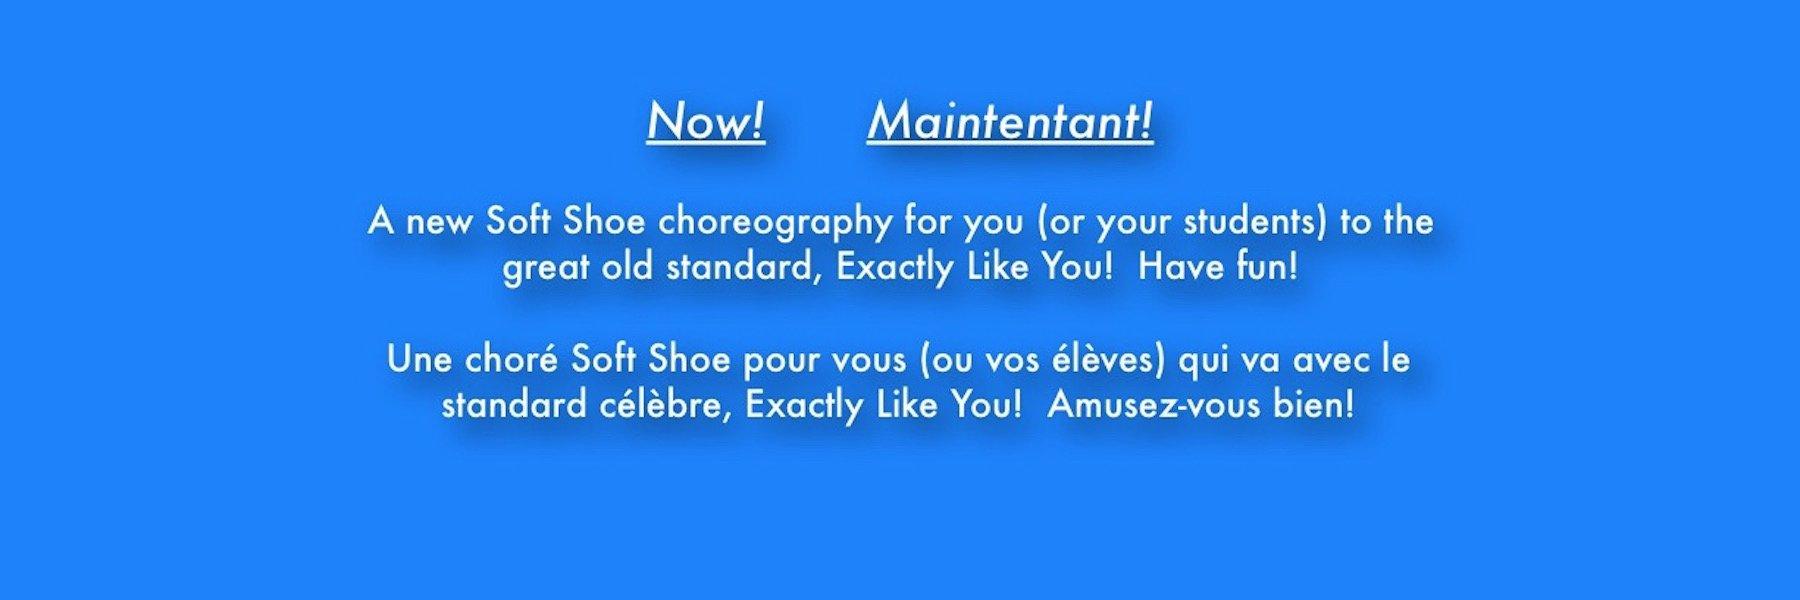 Now! Maintenant! New Choreography! Nouvelle Chorégraphie!